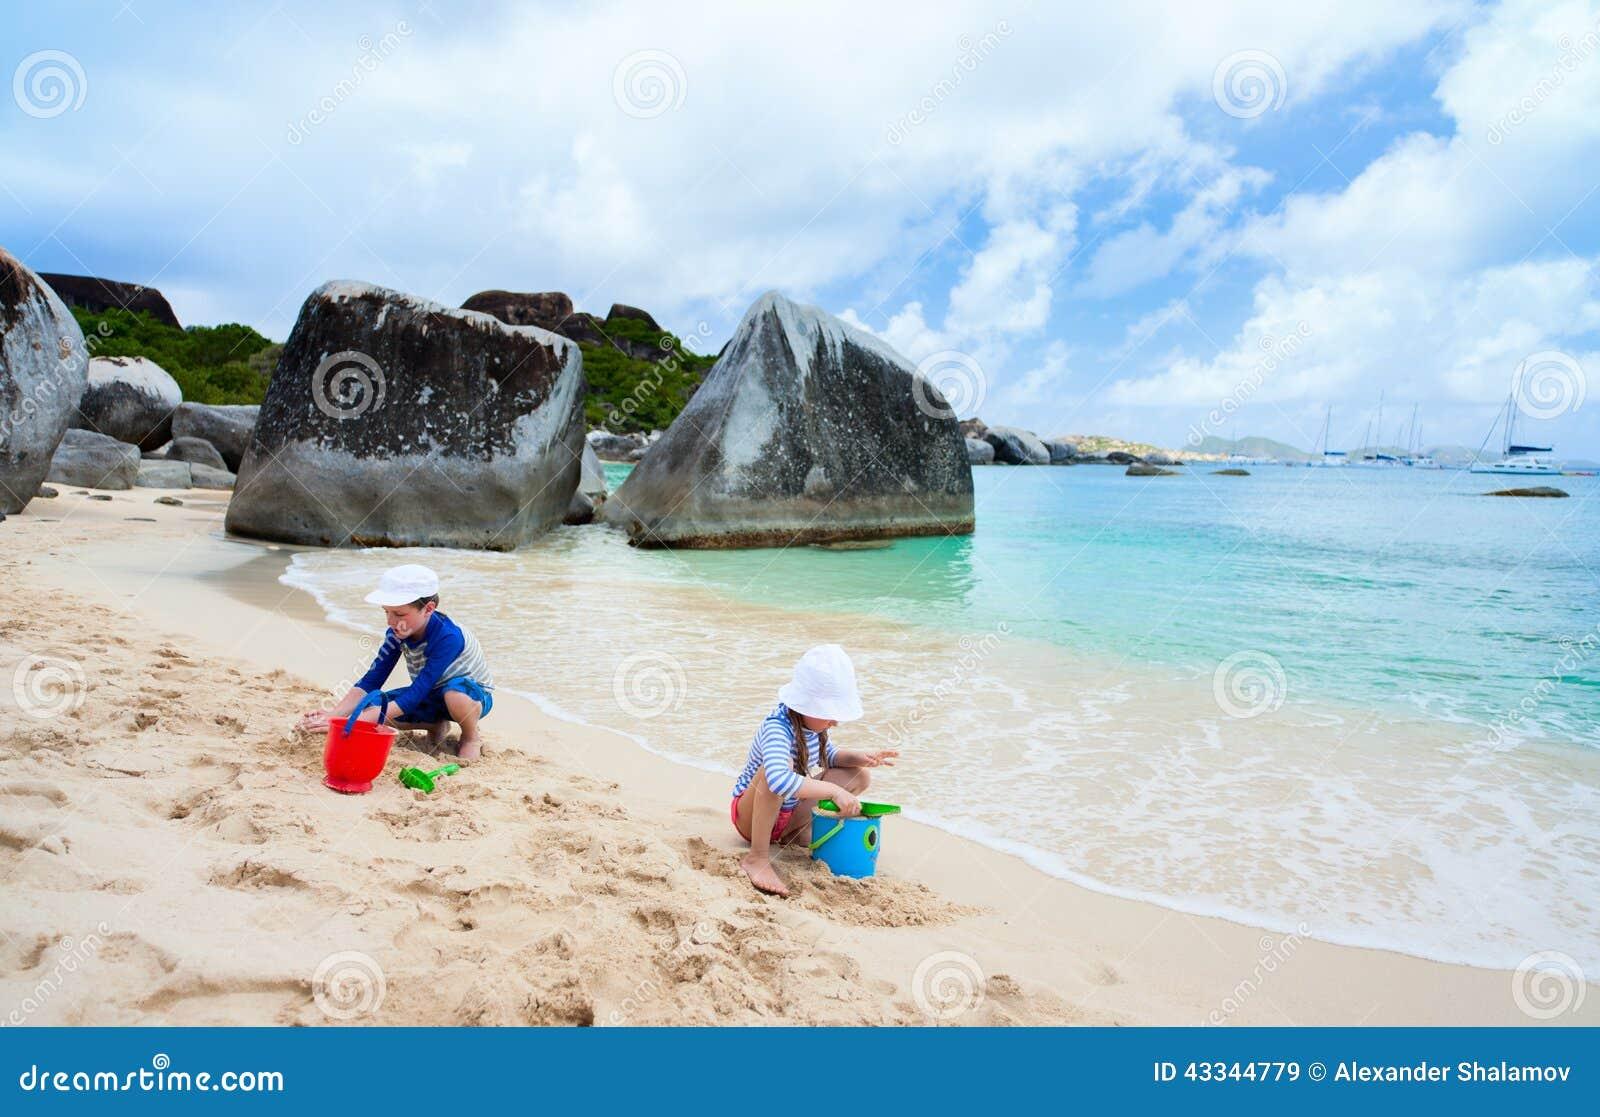 Kids Playing At Beach Stock Photo Image 43344779